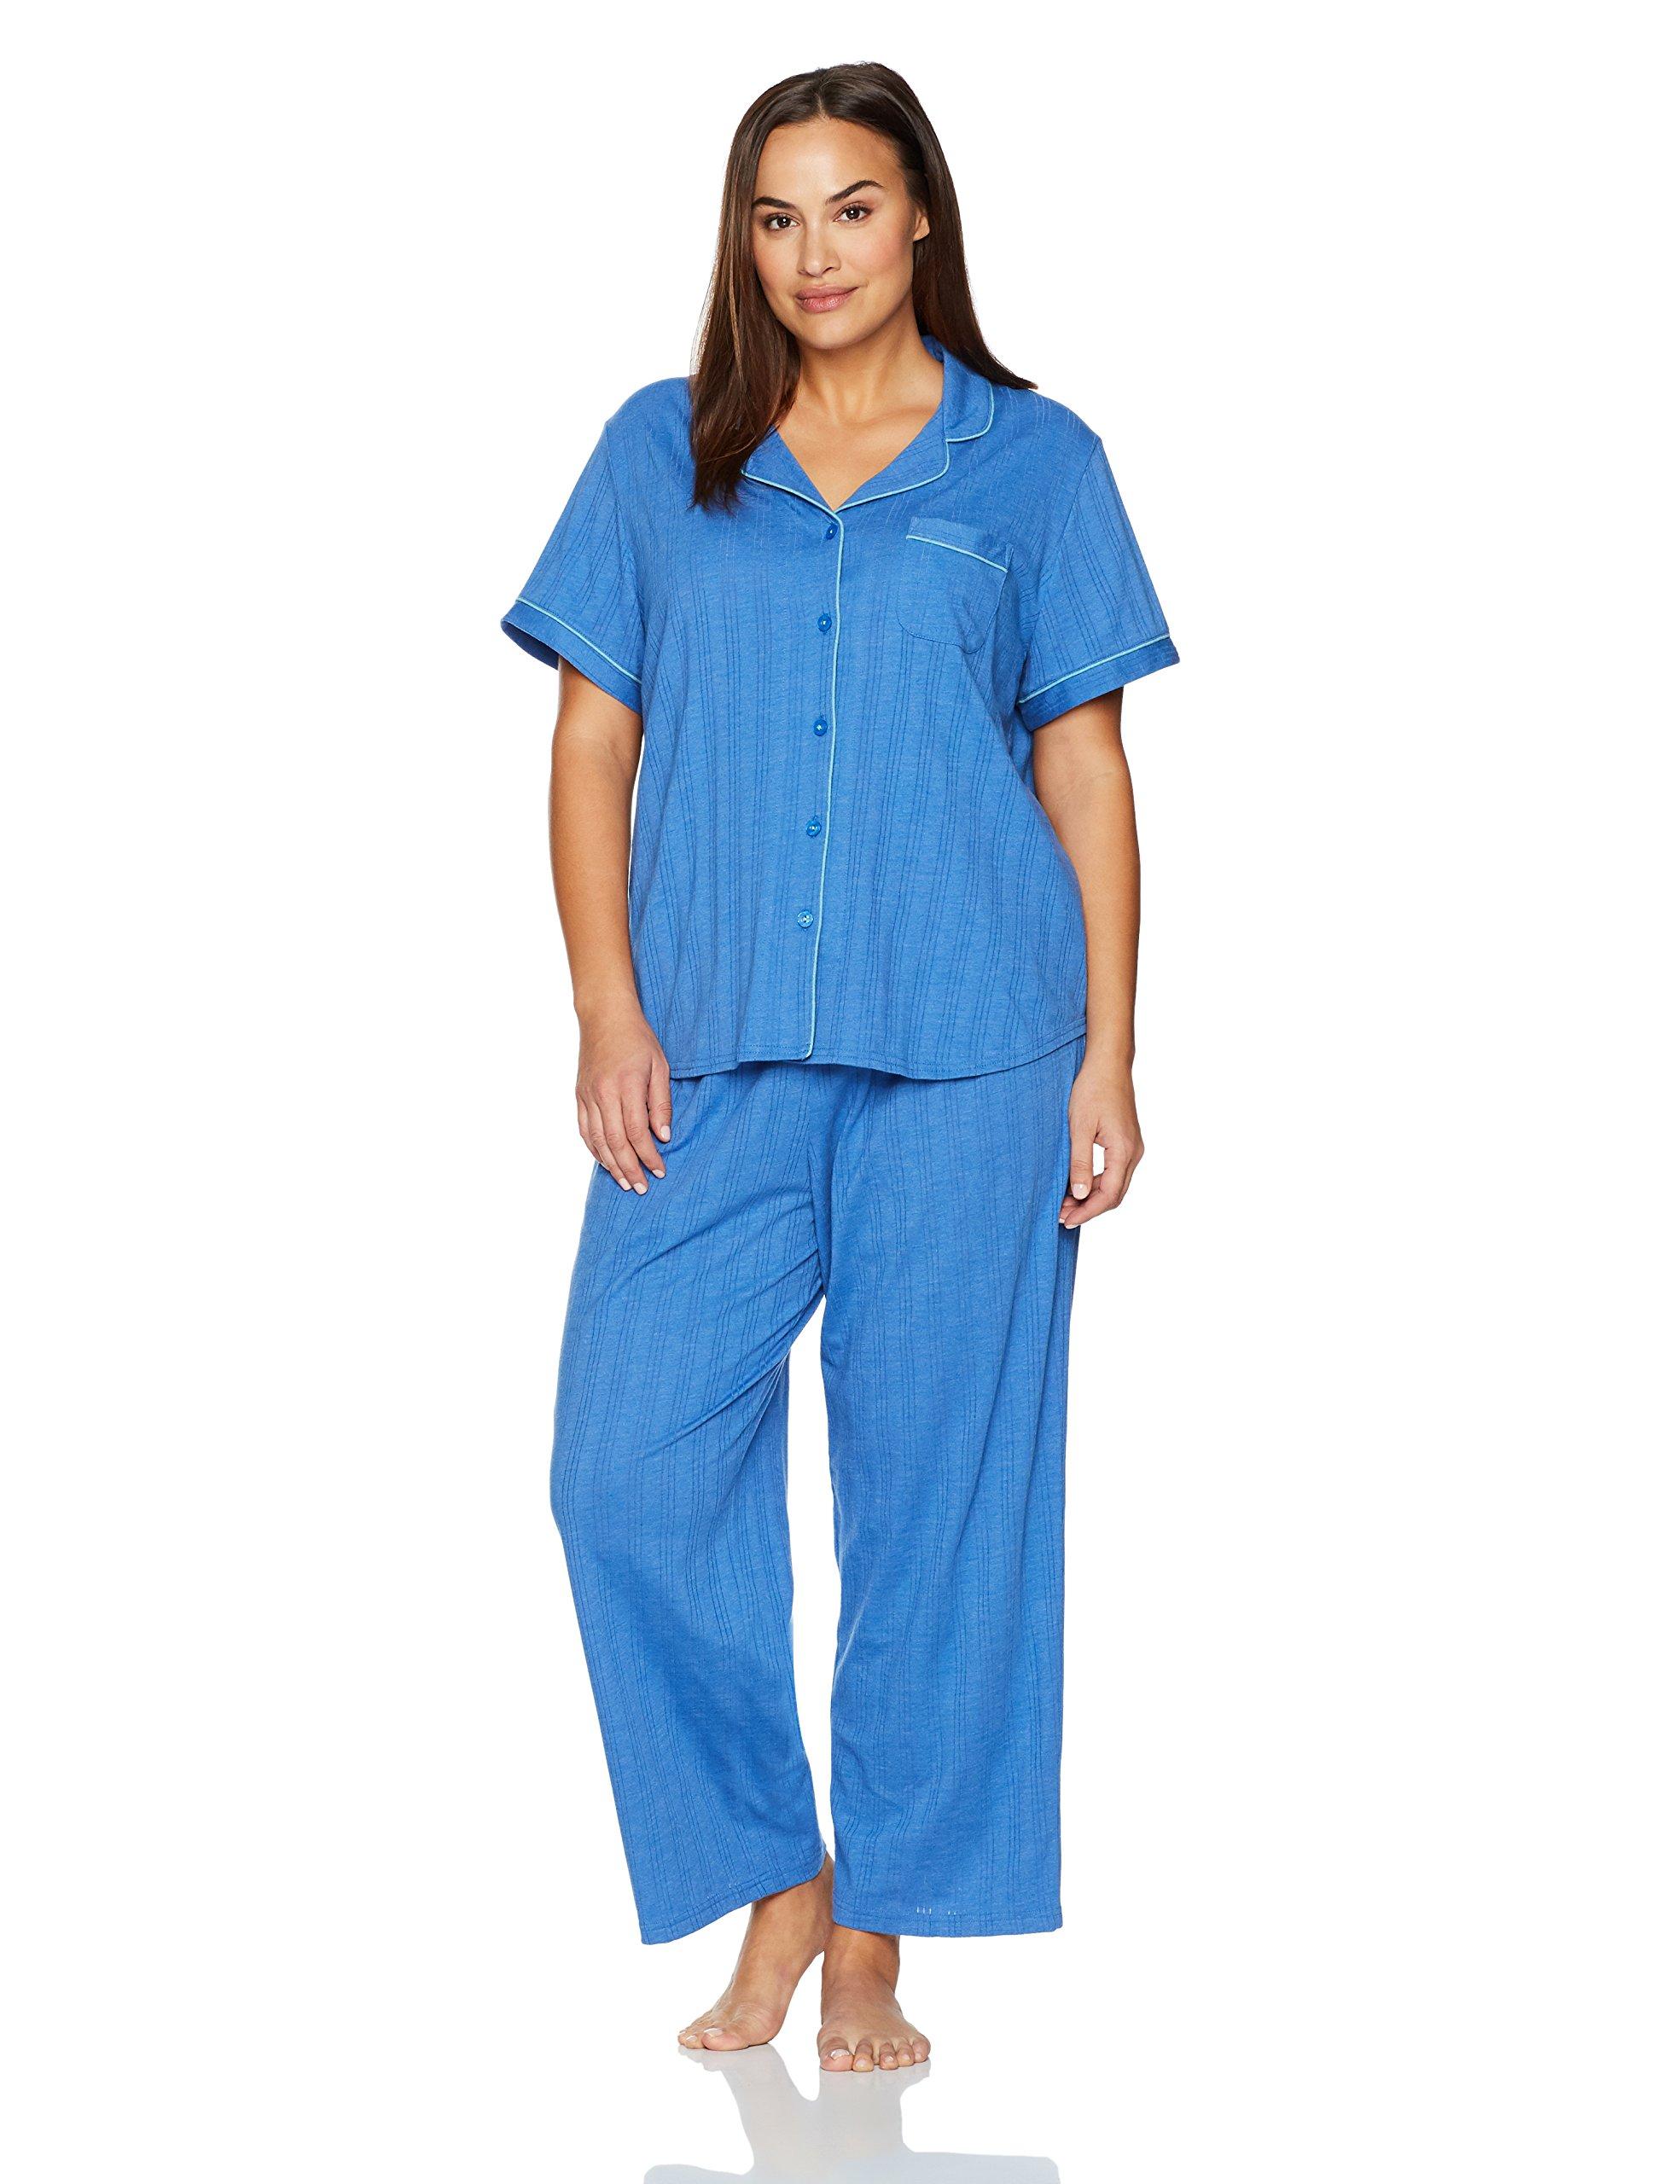 Karen Neuburger Women's Plus Size Pajamas Set Pj, Bay Blue Heather, 2X